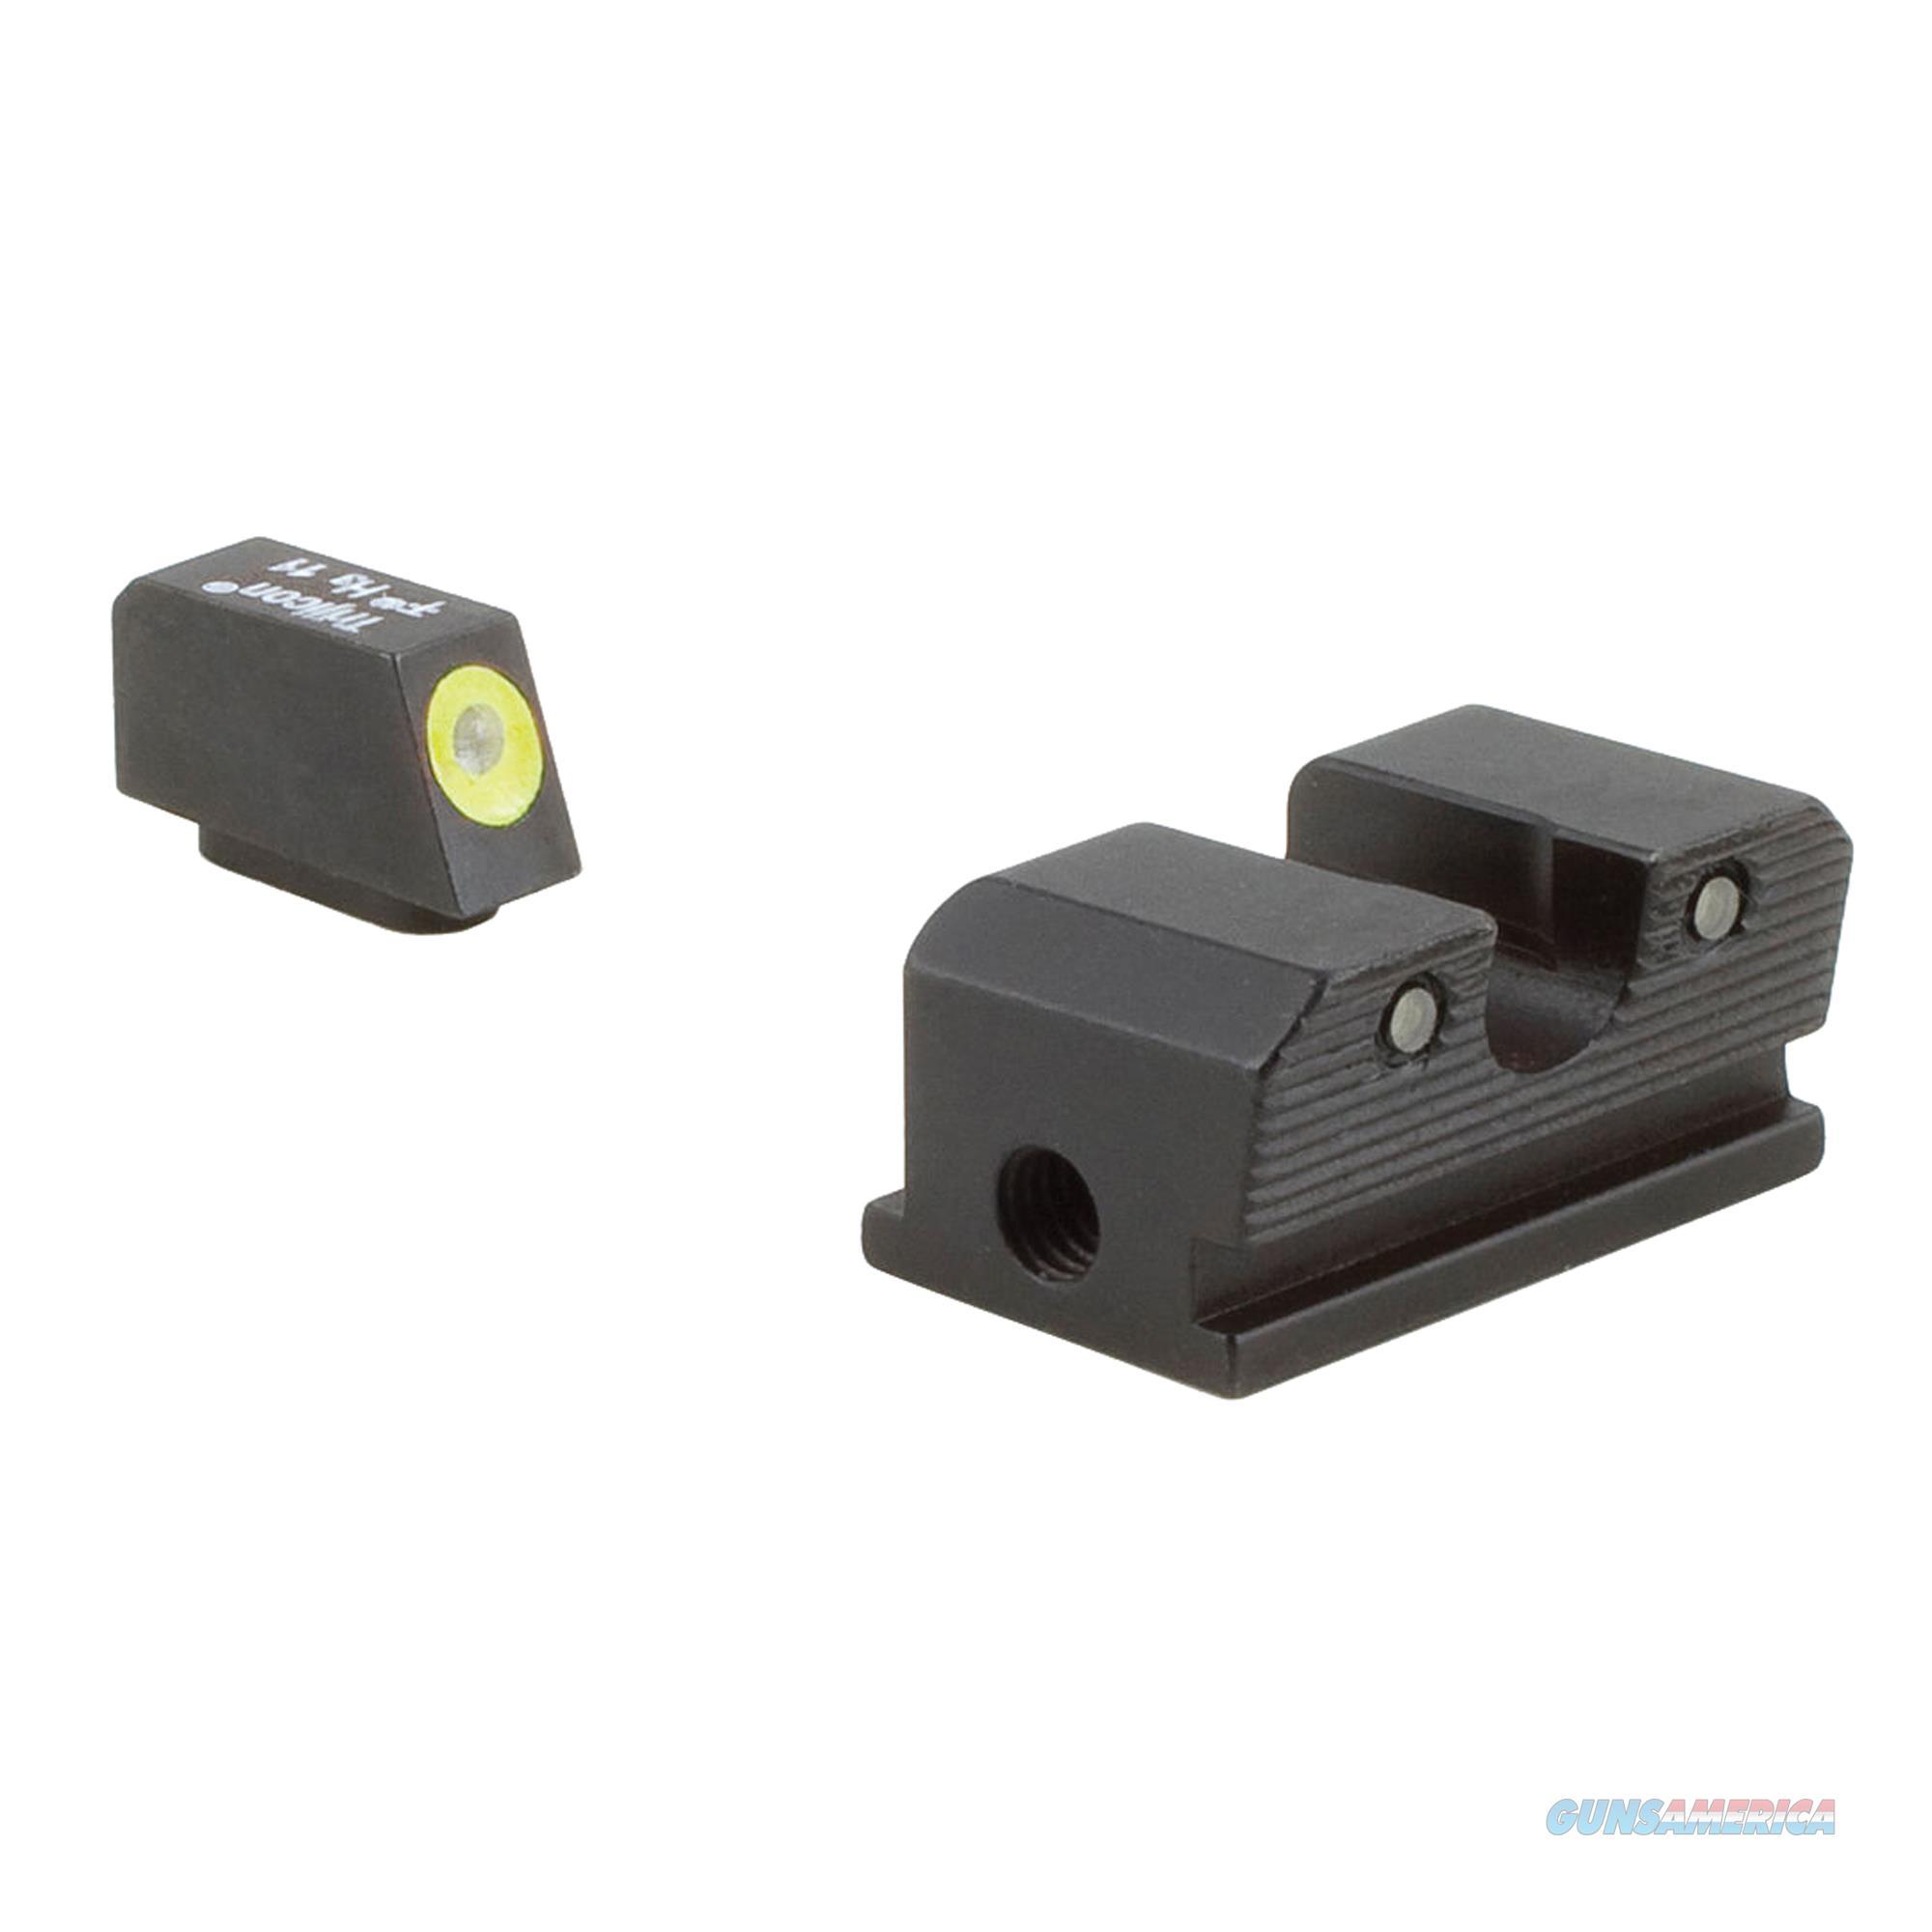 Trius Products Walther Hd Night Sight Set WP101-C-600737  Non-Guns > Iron/Metal/Peep Sights